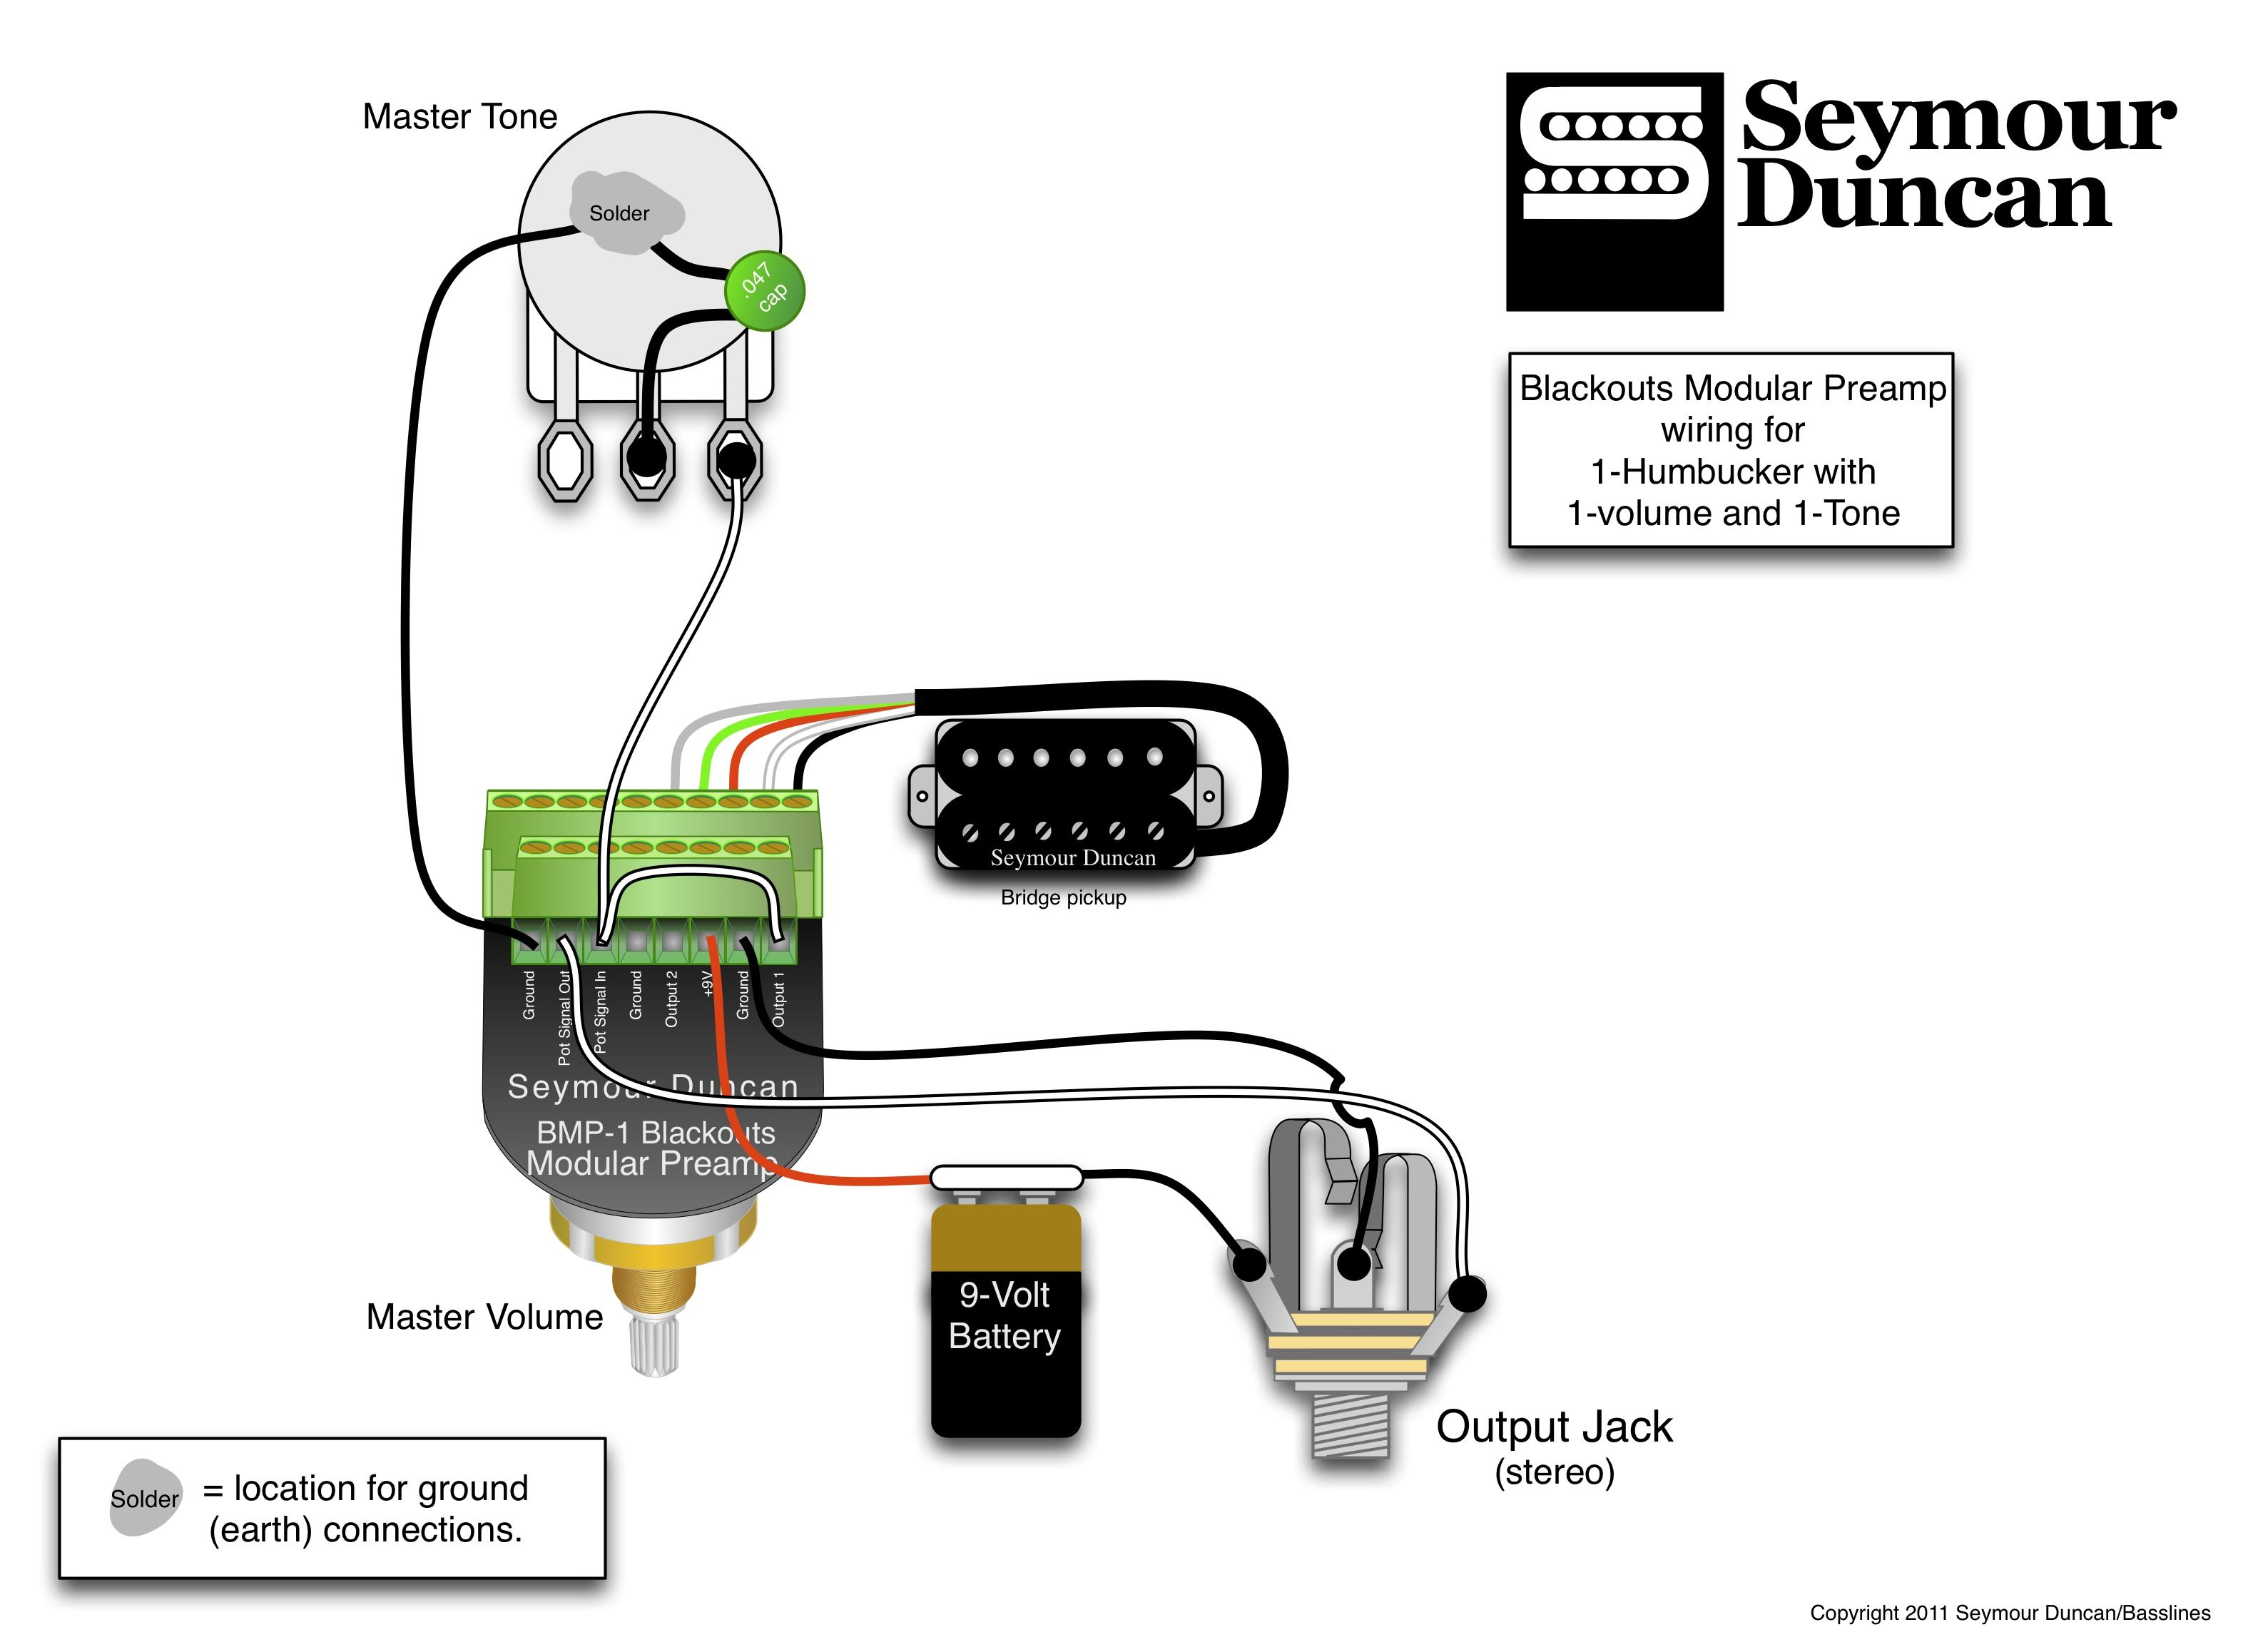 Seymour Duncan Firebird Vii Wiring Diagram